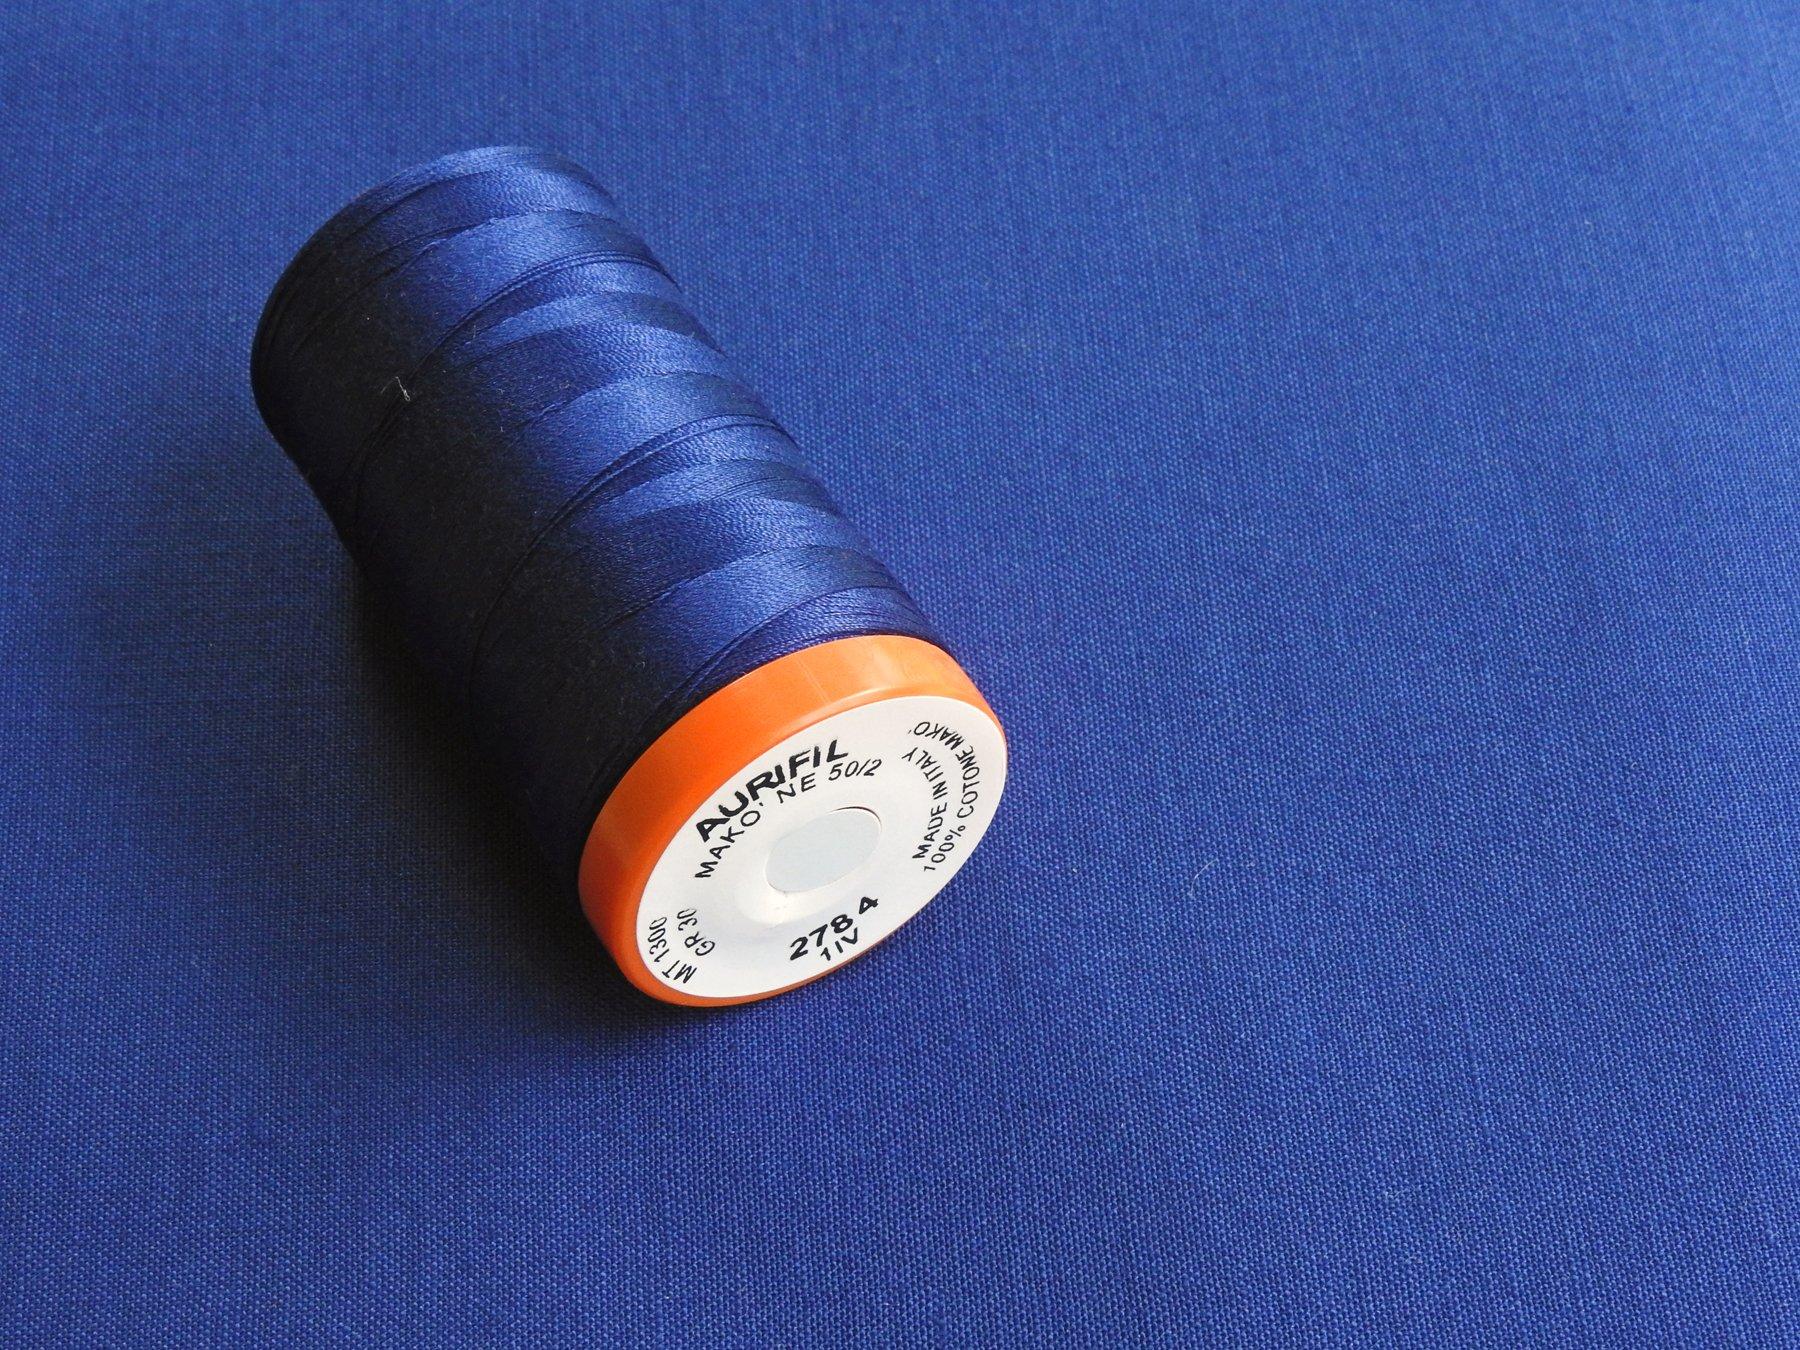 Stash Fabrics - Pulsar Backing (Kona Cotton Nightfall) and Matching Aurifil Thread from Red Rock Threads